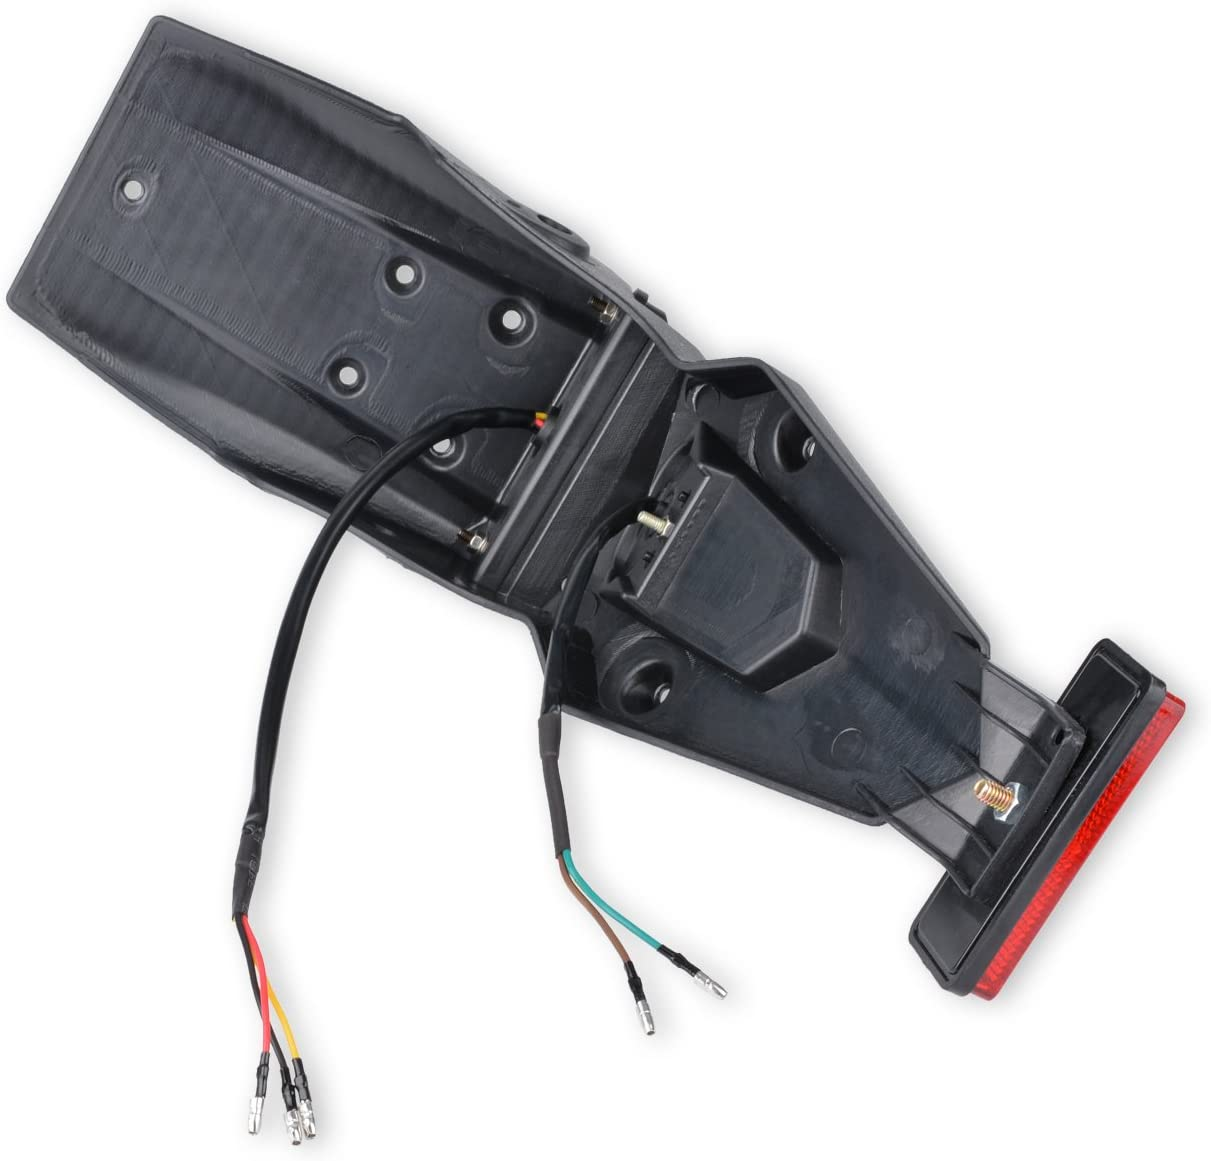 Red Shell KaTur 12V LED Motorcycle Fender Rear Tail Stop Light Reflector Universal for MX Motocross Sport Pit Dirt Bike